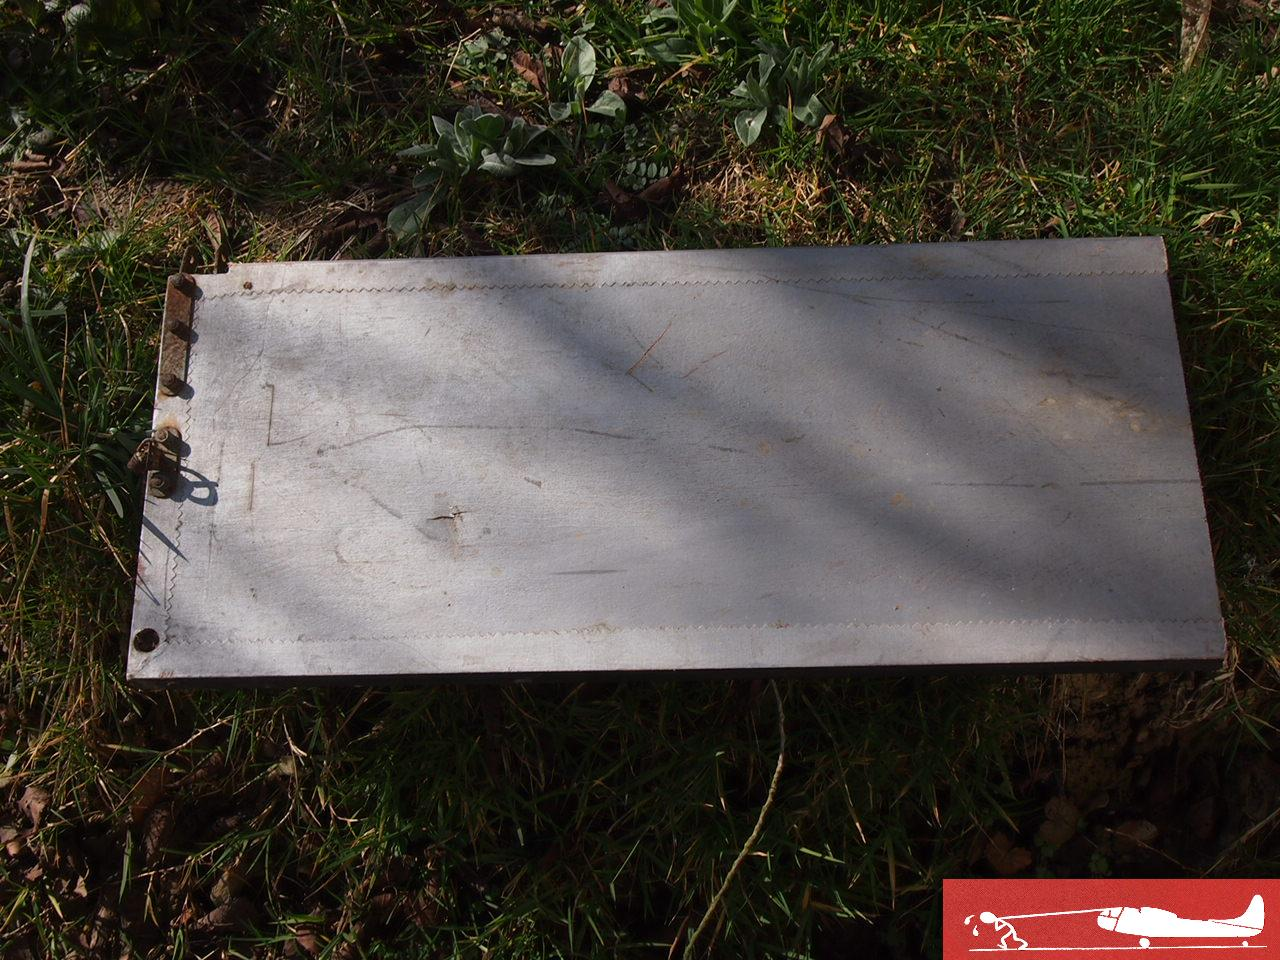 [Gliderborne] Restauration planeur WACO CG-4A P4099197